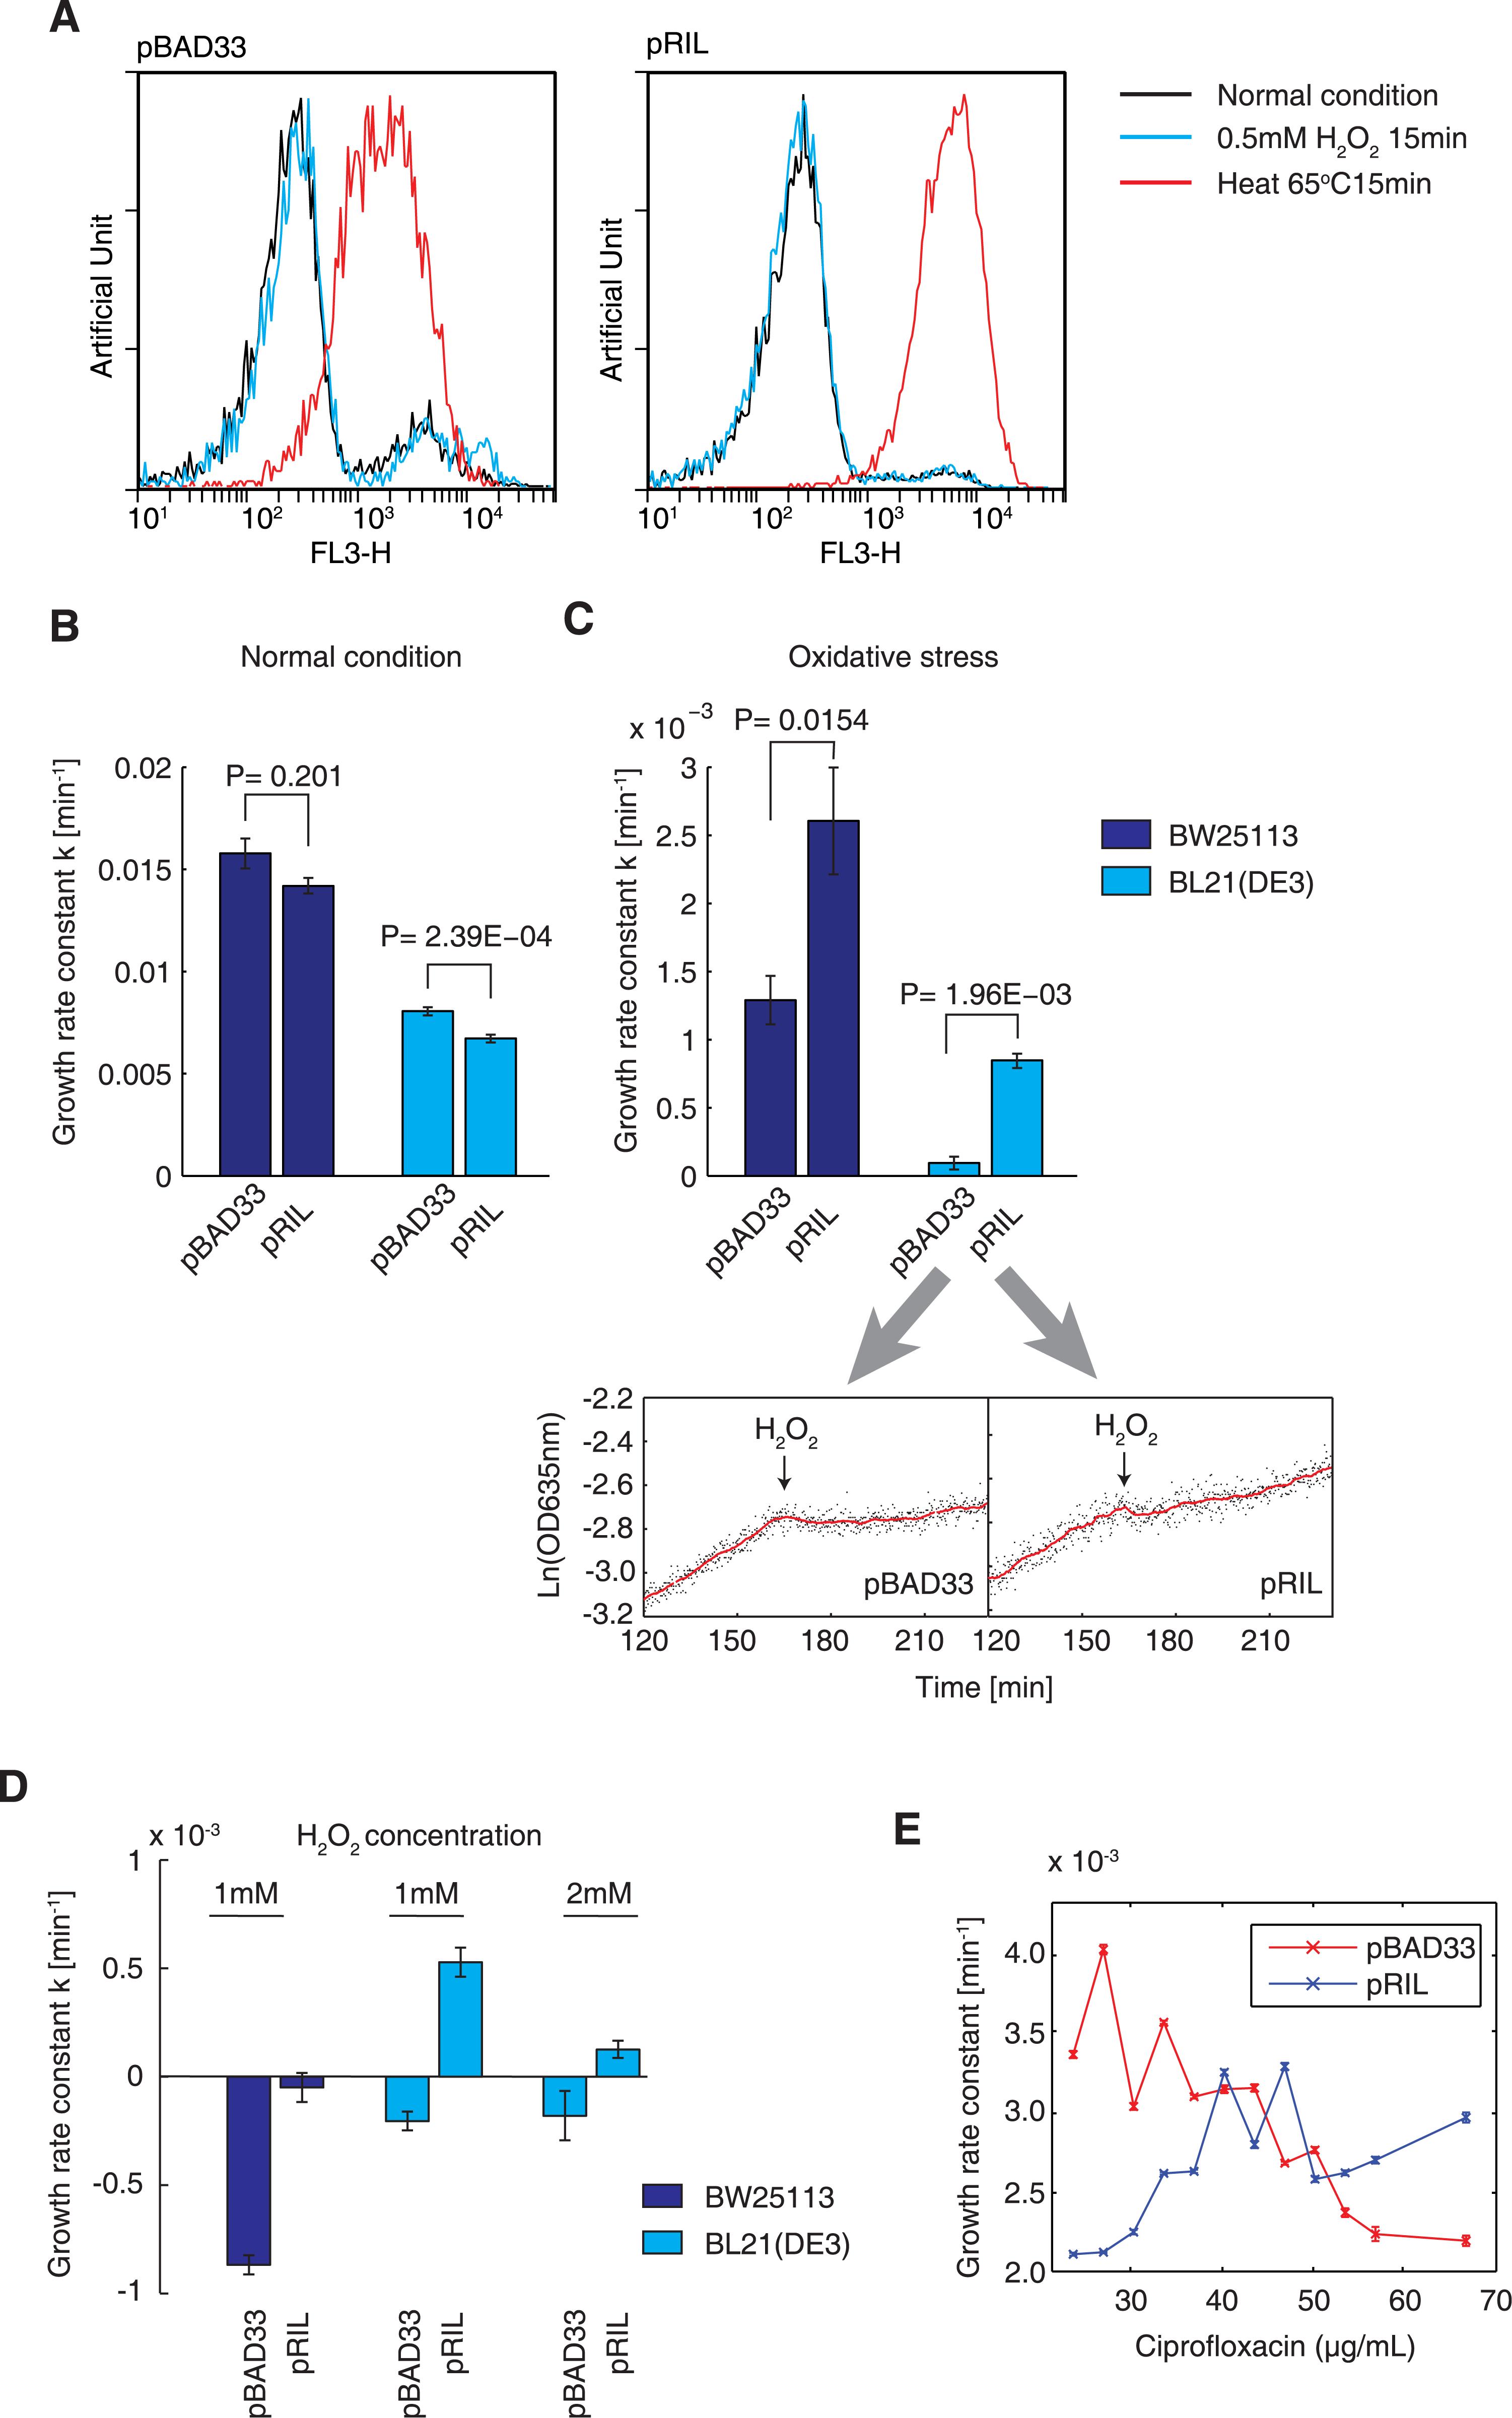 Higher tRNA concentrations improve adaptation under oxidative stress.